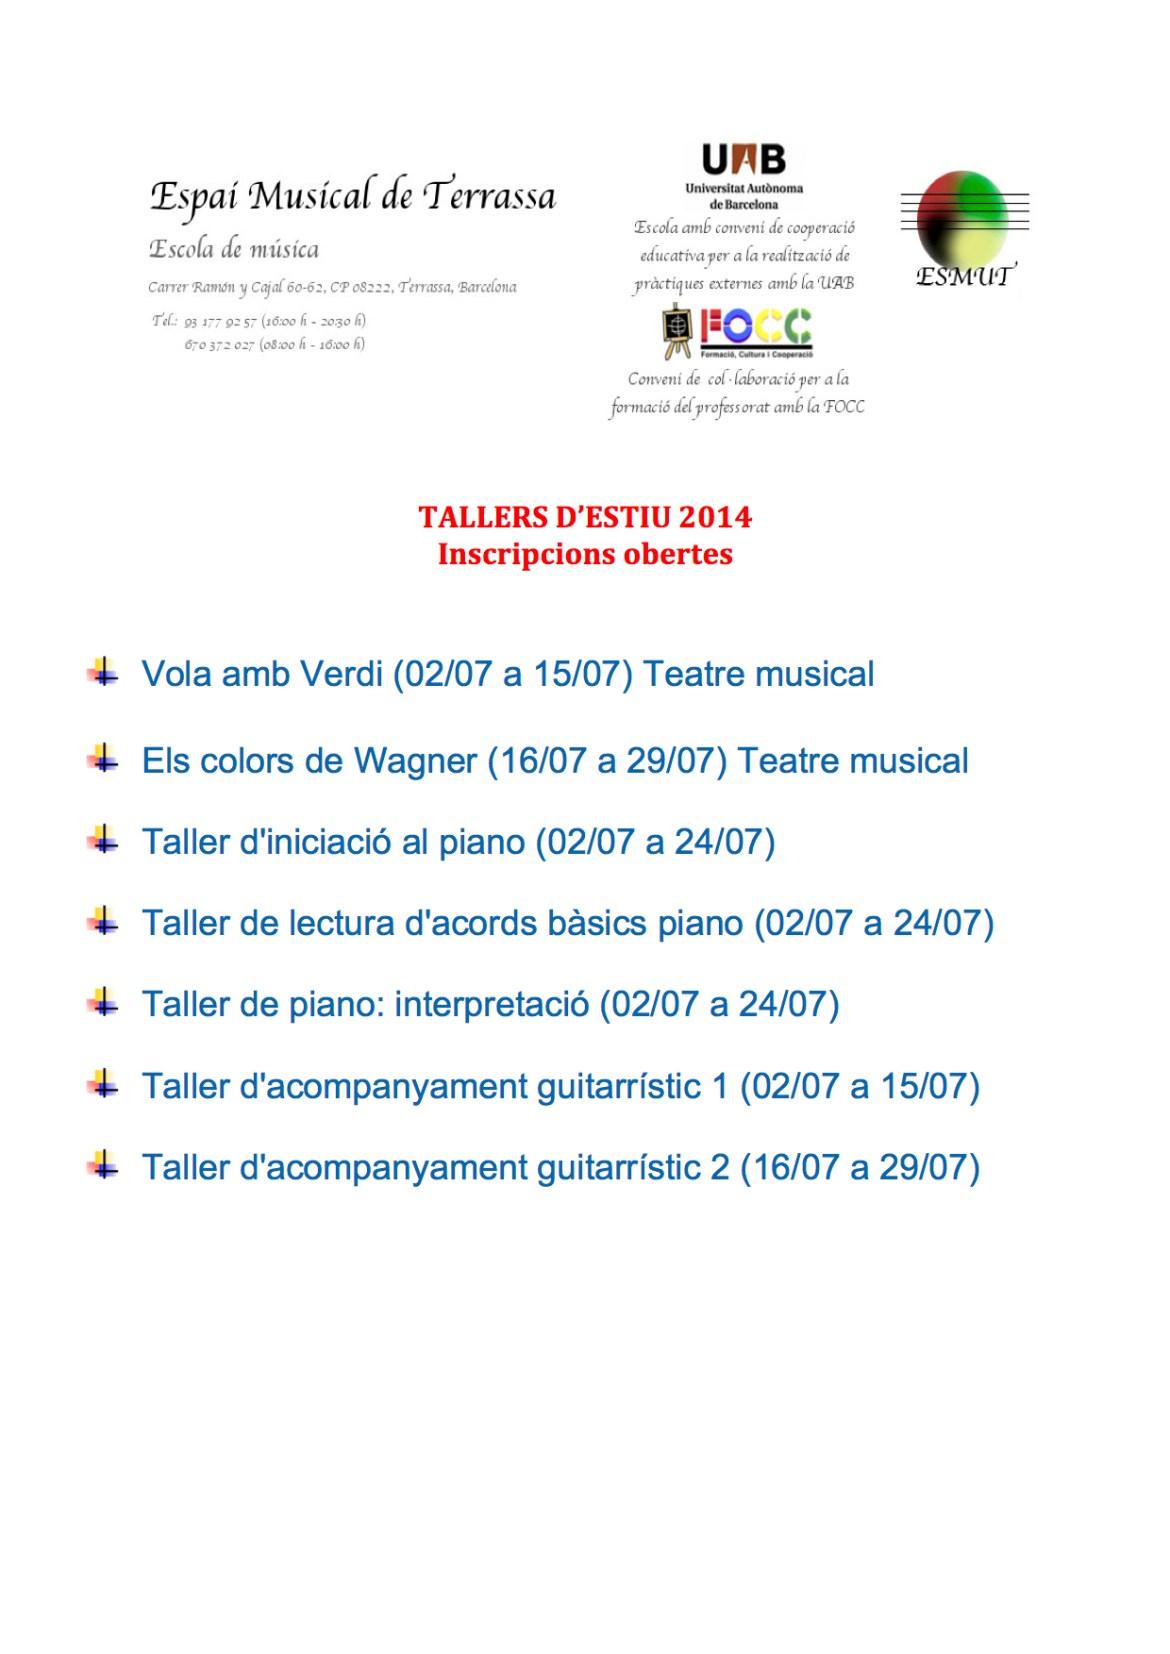 TALLERS D'ESTIU 2014